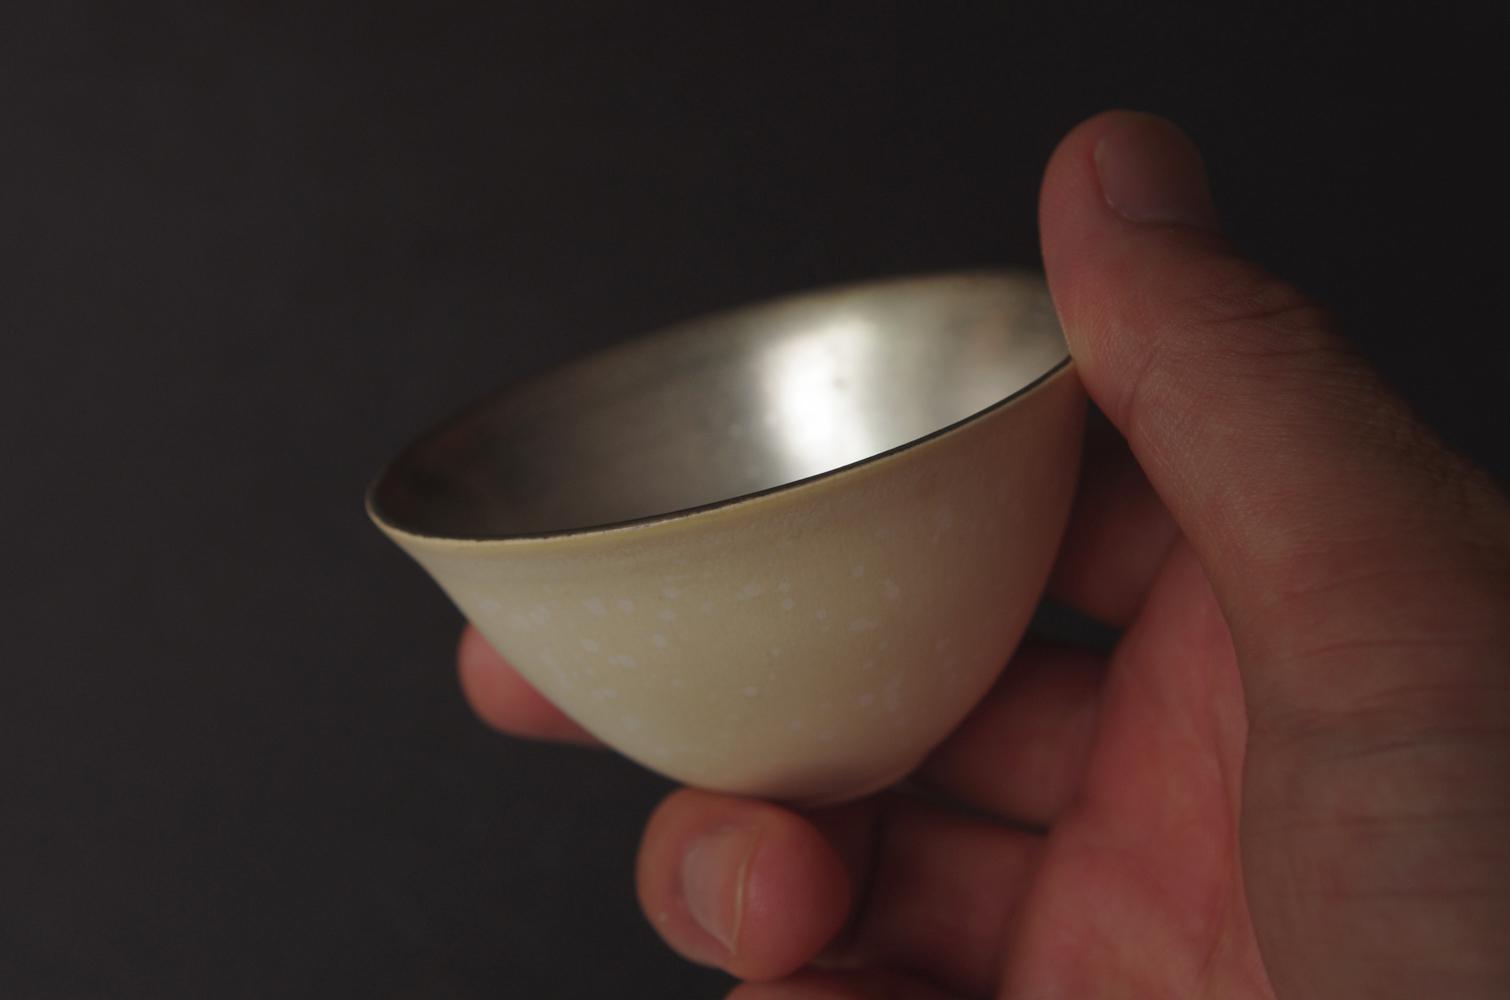 福岡彩子 sake cup sv-1